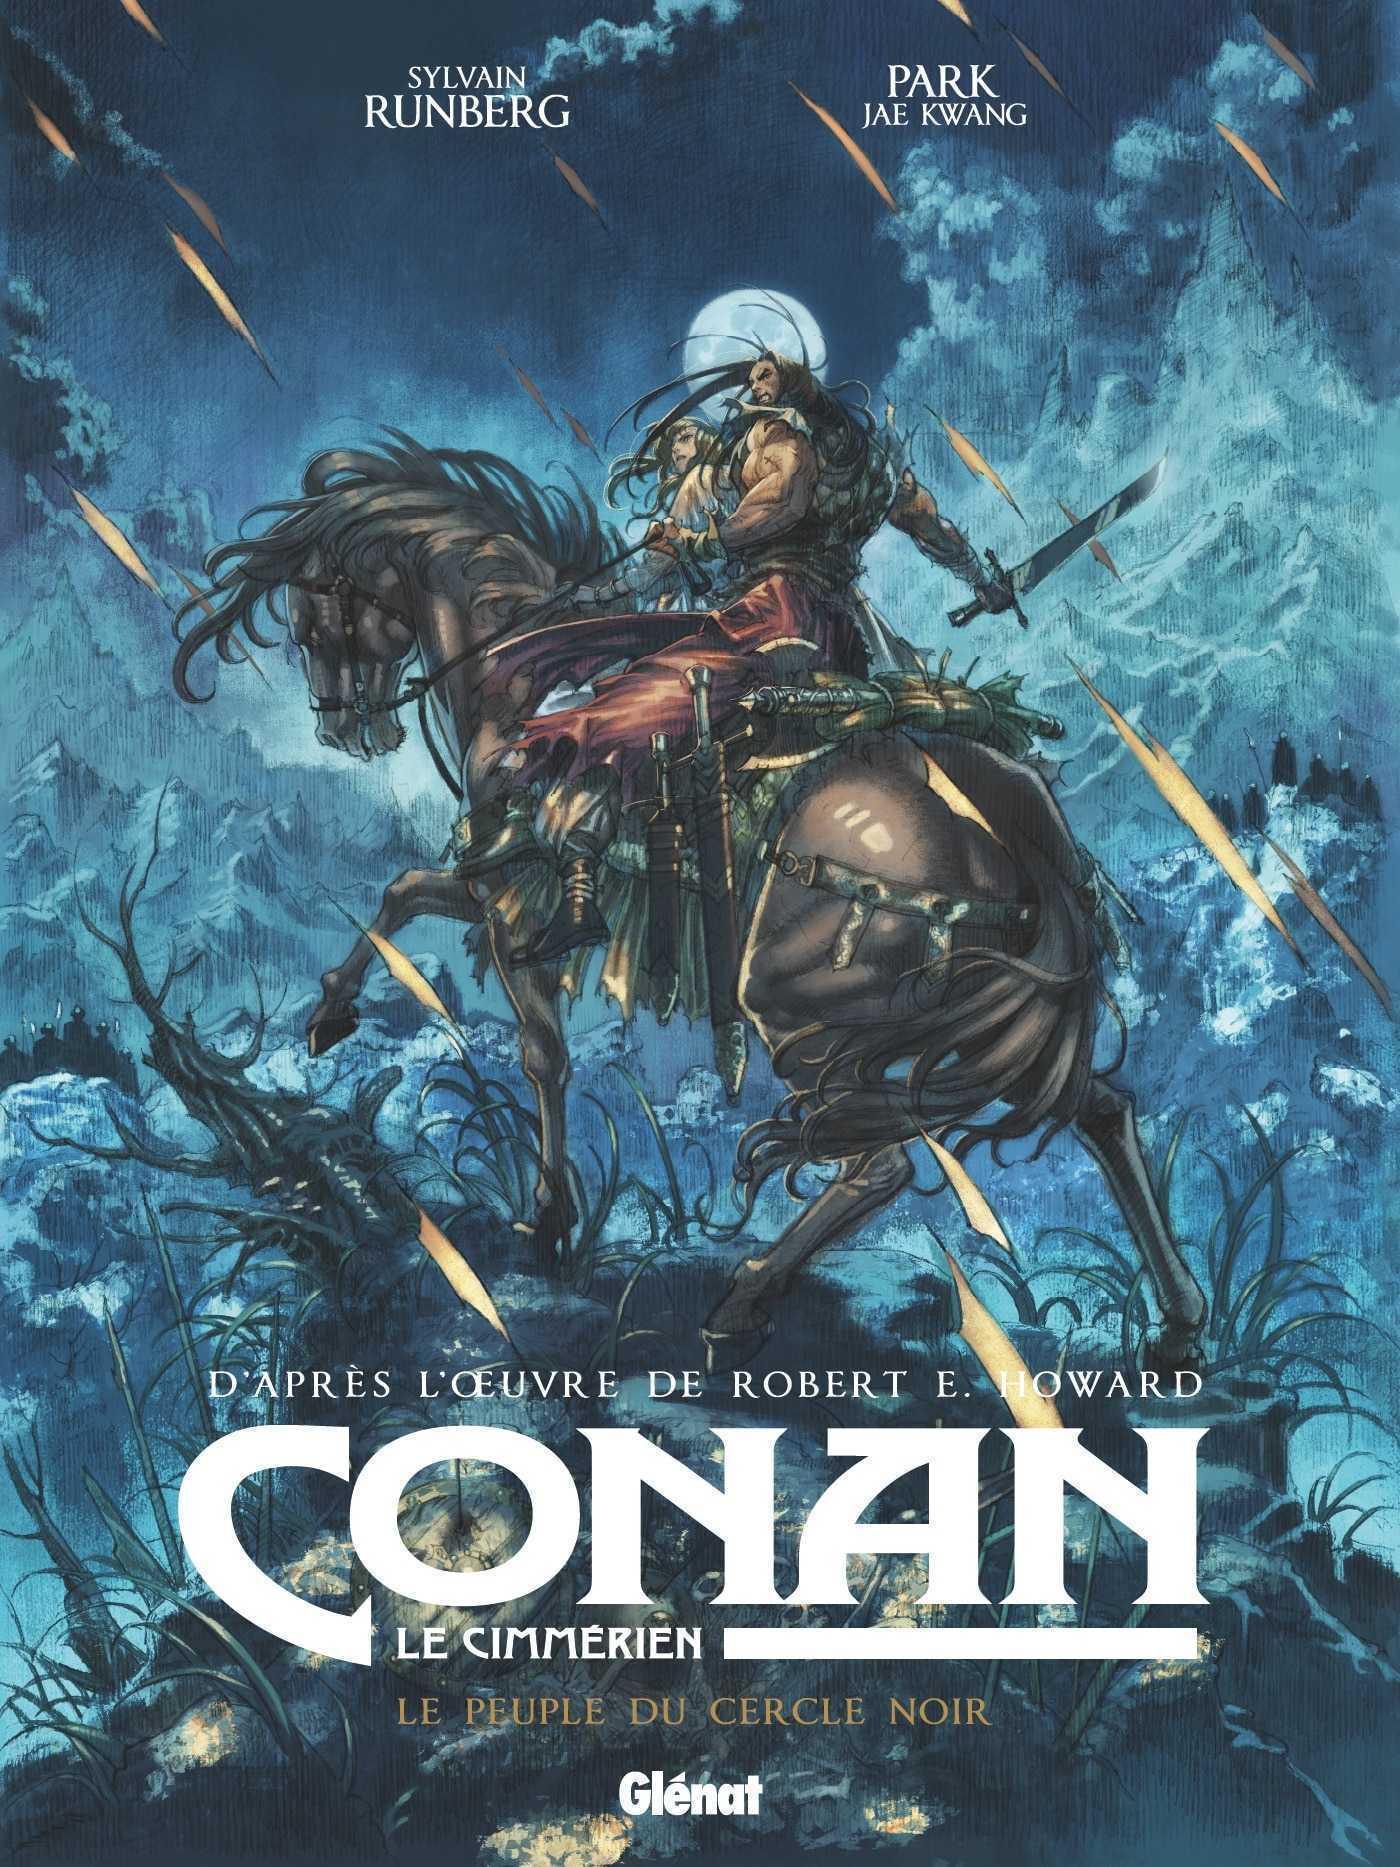 Conan le Cimmérien, Runberg et Jae Kwang imposent leur style